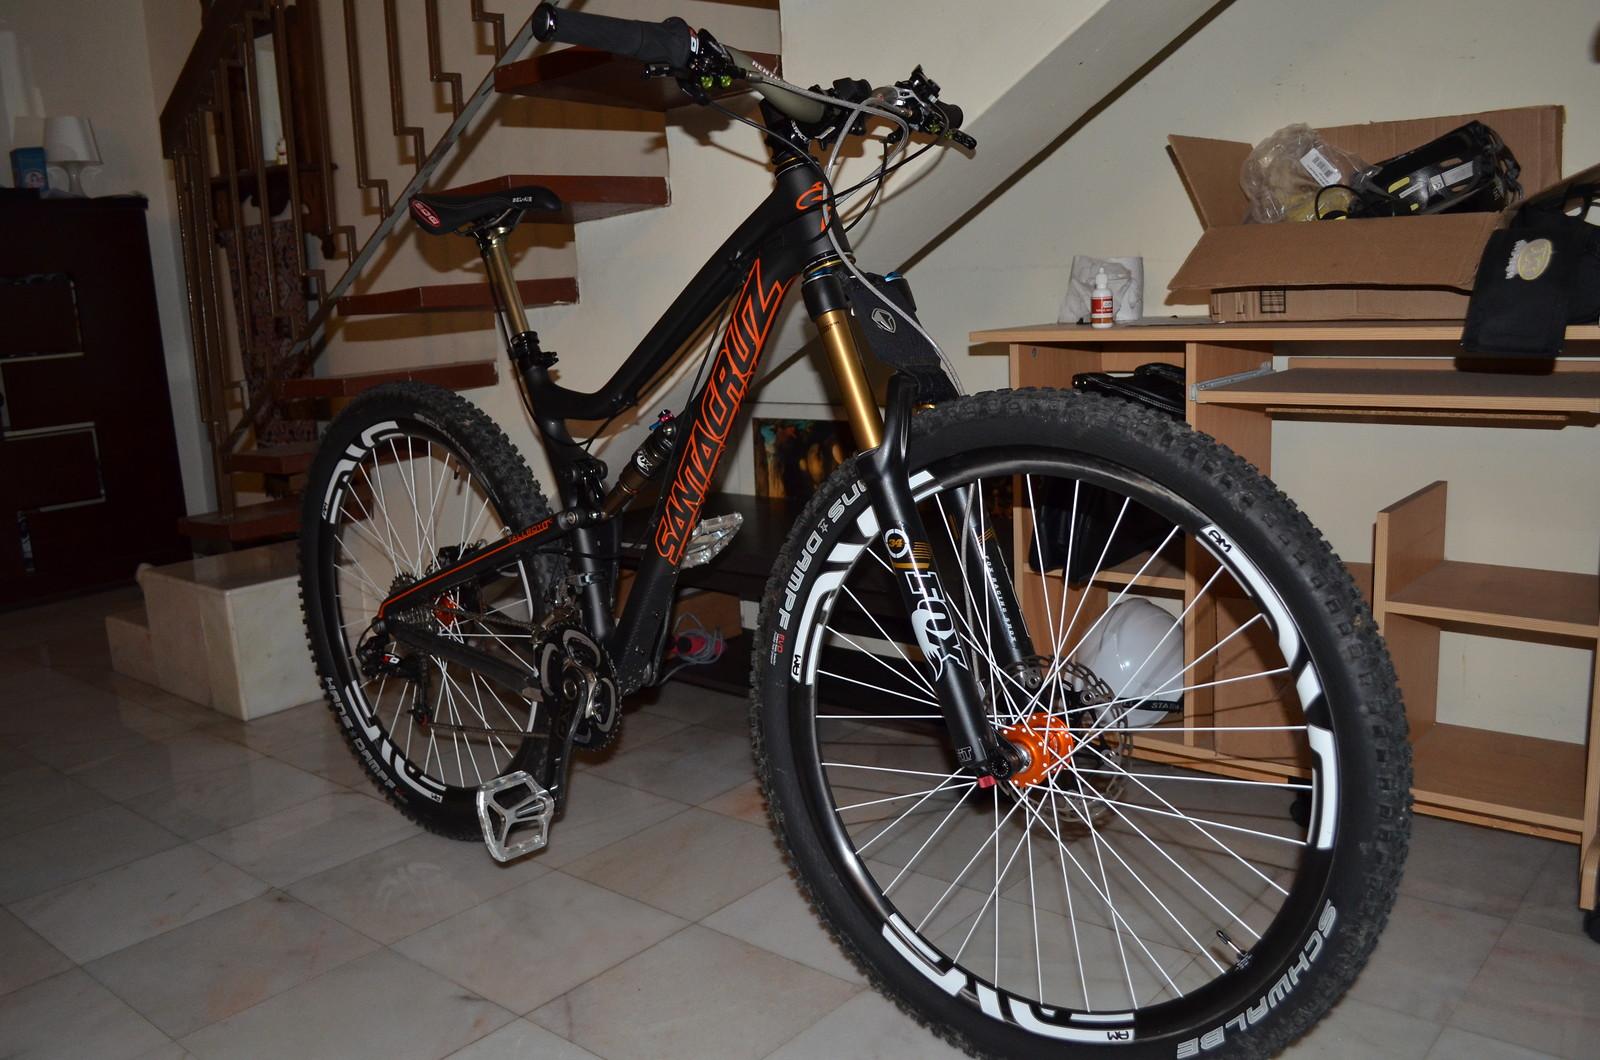 DSC 4570 - kenneth.jonathan.perkins.jr - Mountain Biking Pictures - Vital MTB